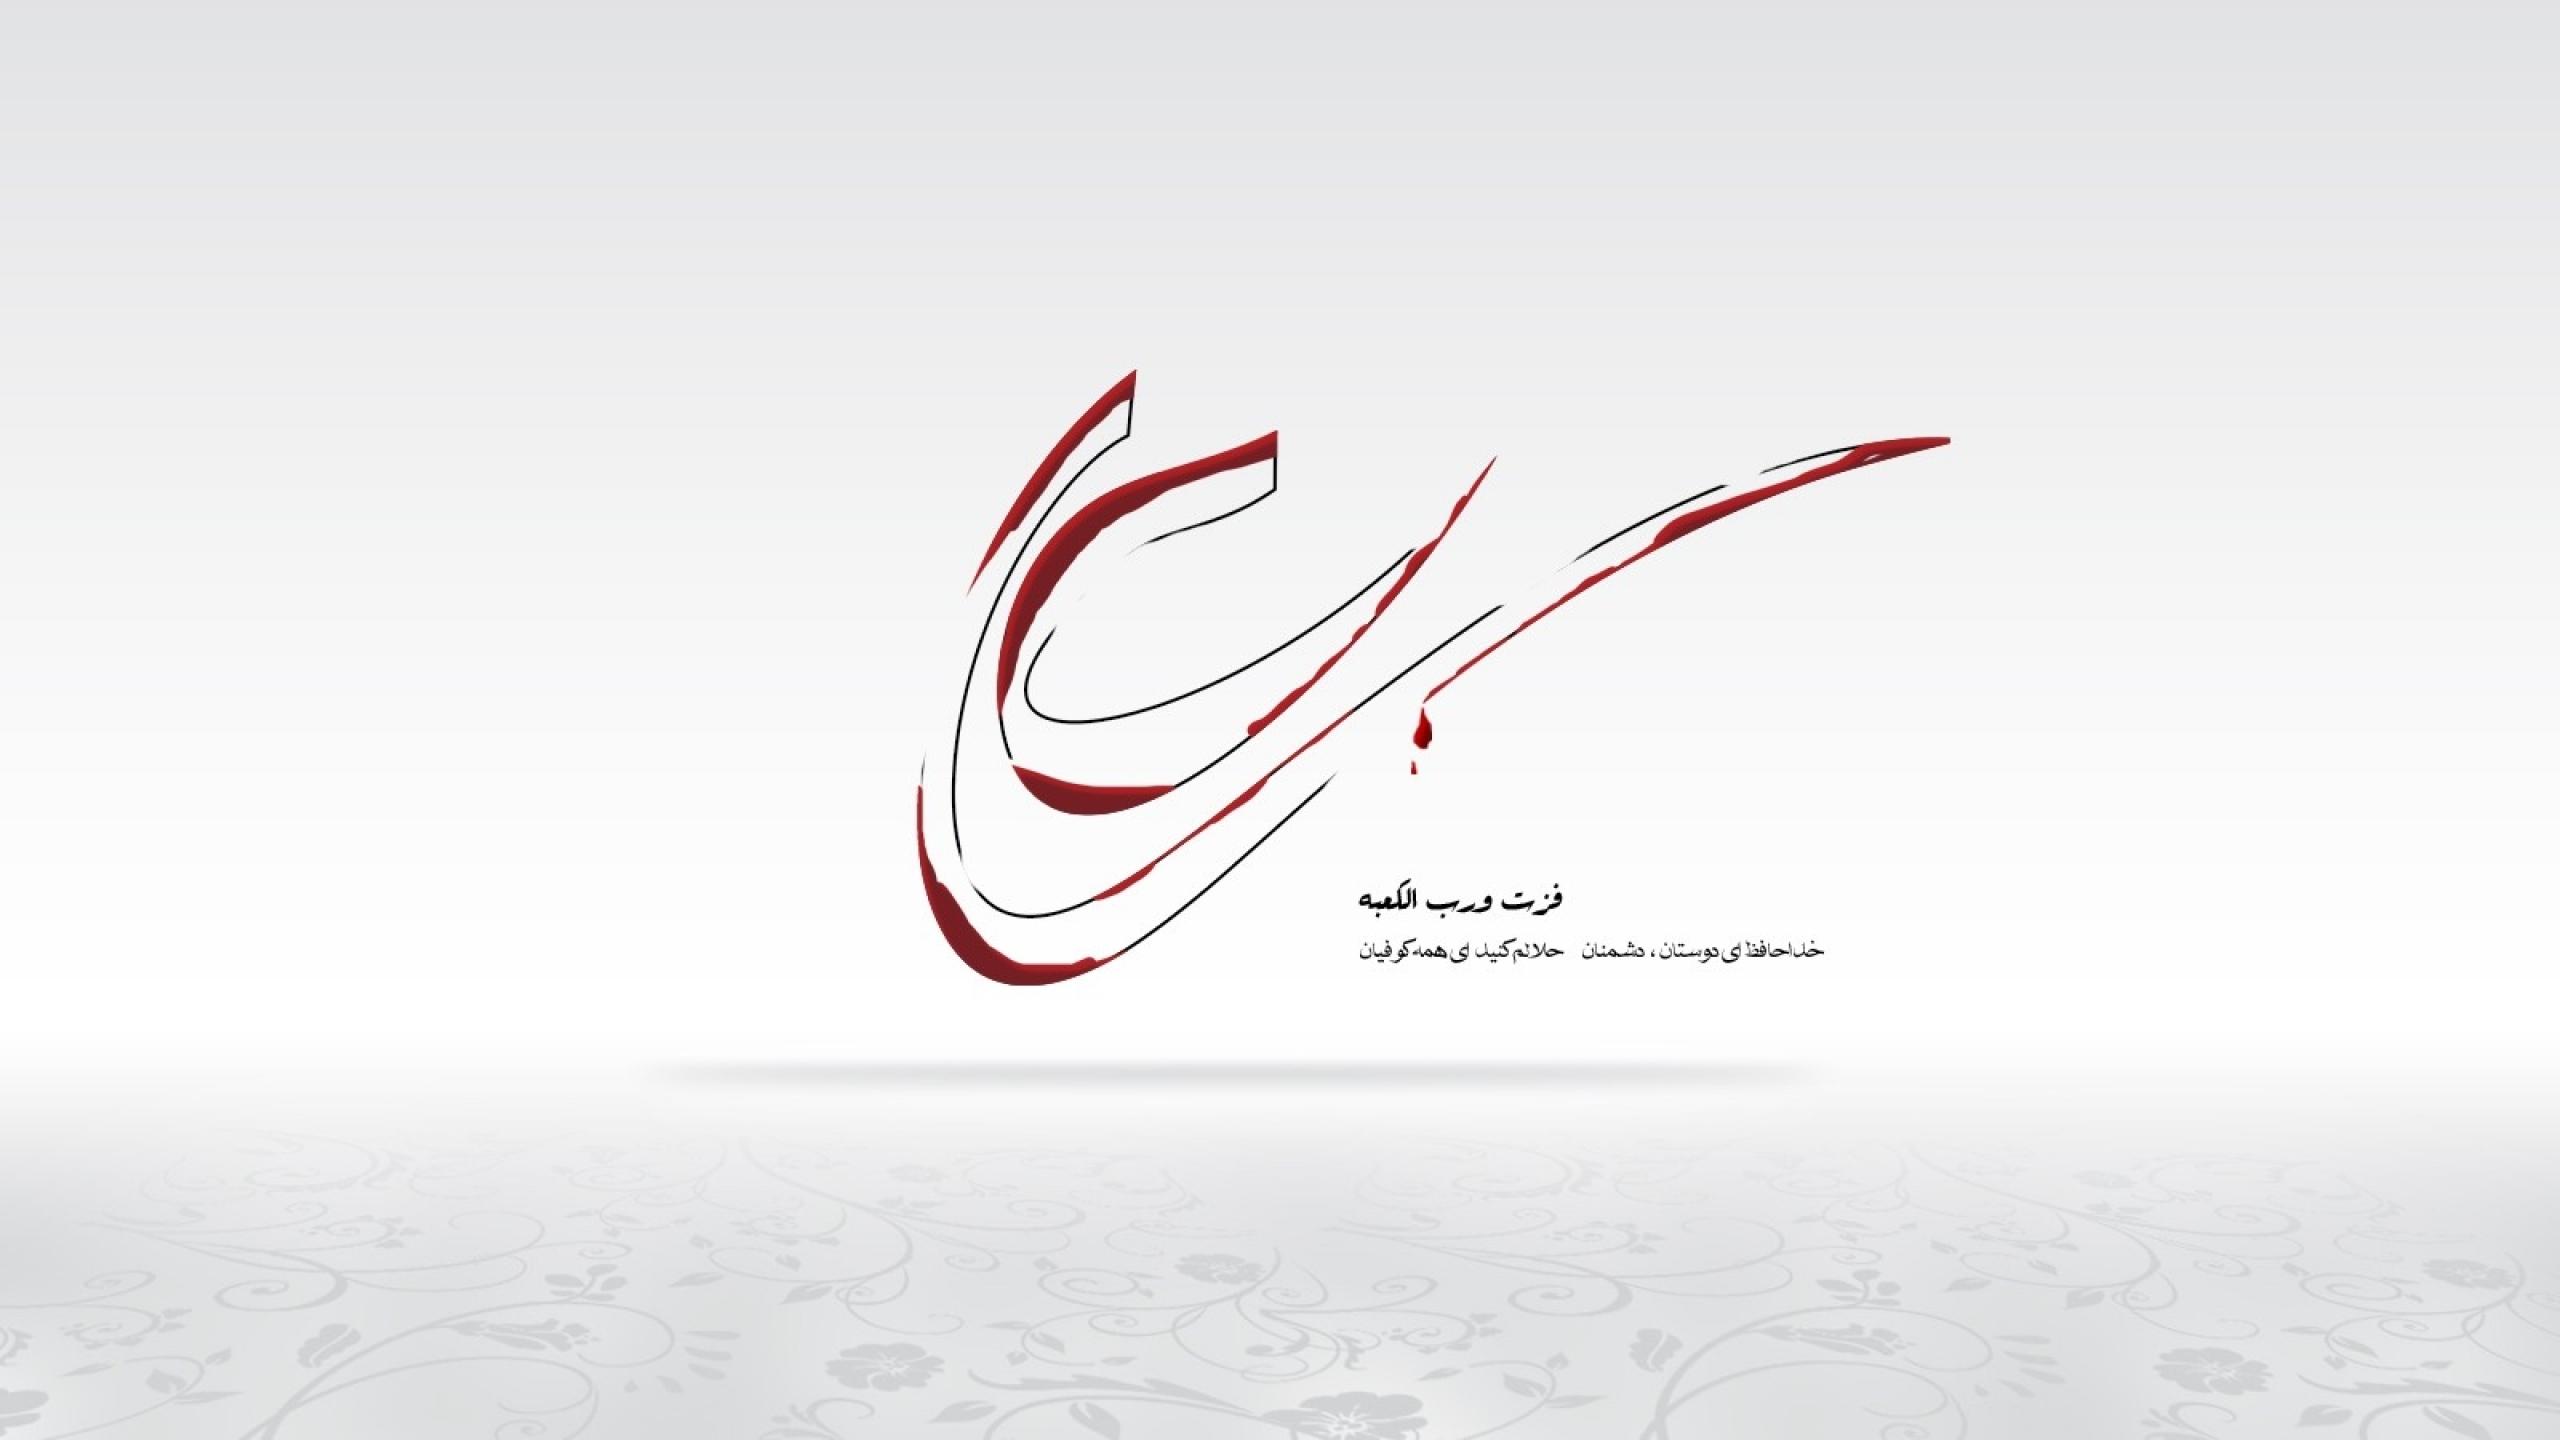 religion islam prophet imam ali 1600x900 wallpaper Art HD Wallpaper 2560x1440